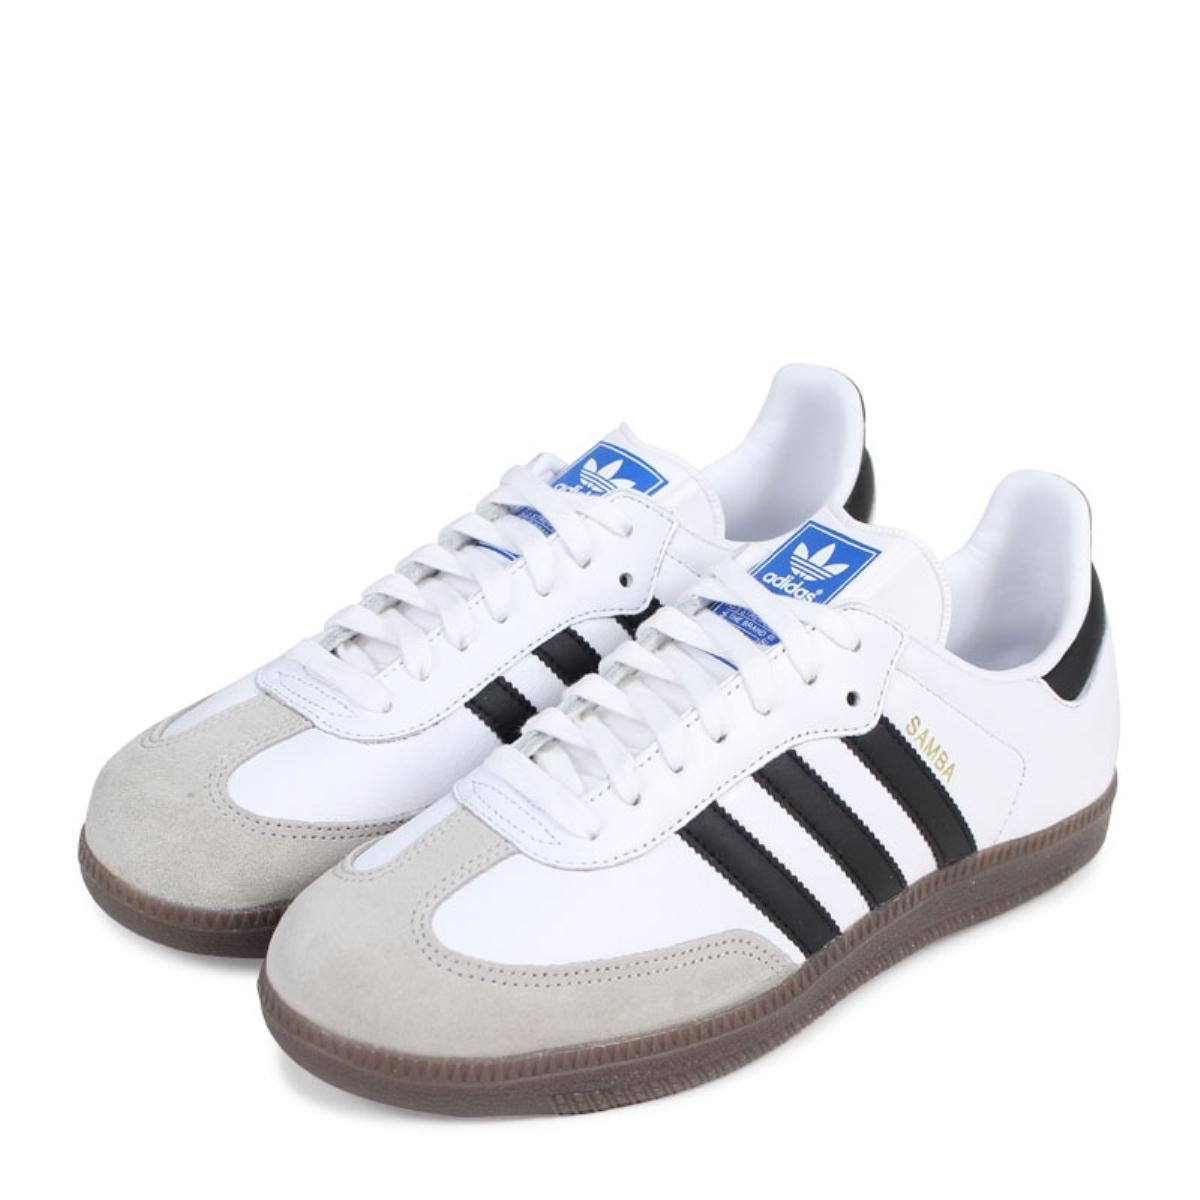 adidas Originals Men's Samba OG Shoe kondisko Shoes